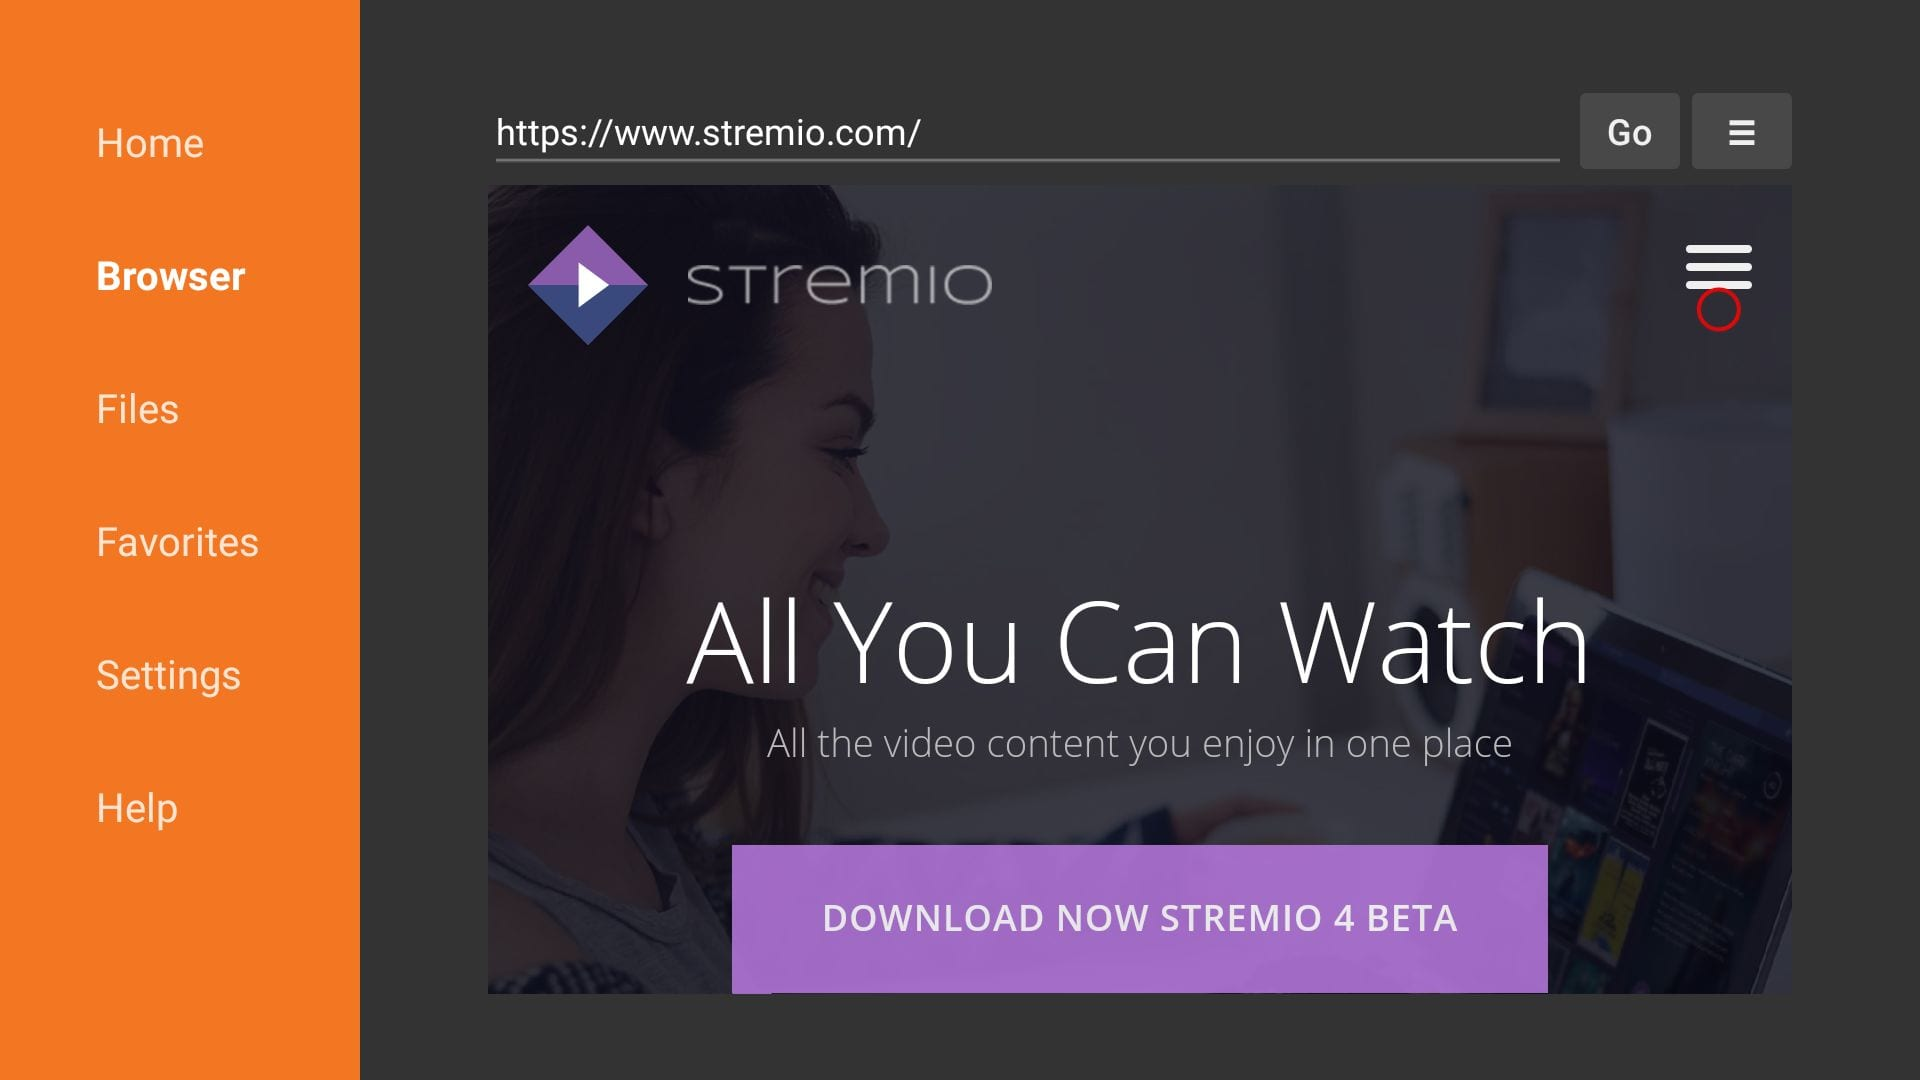 steps to install stremio on firestick